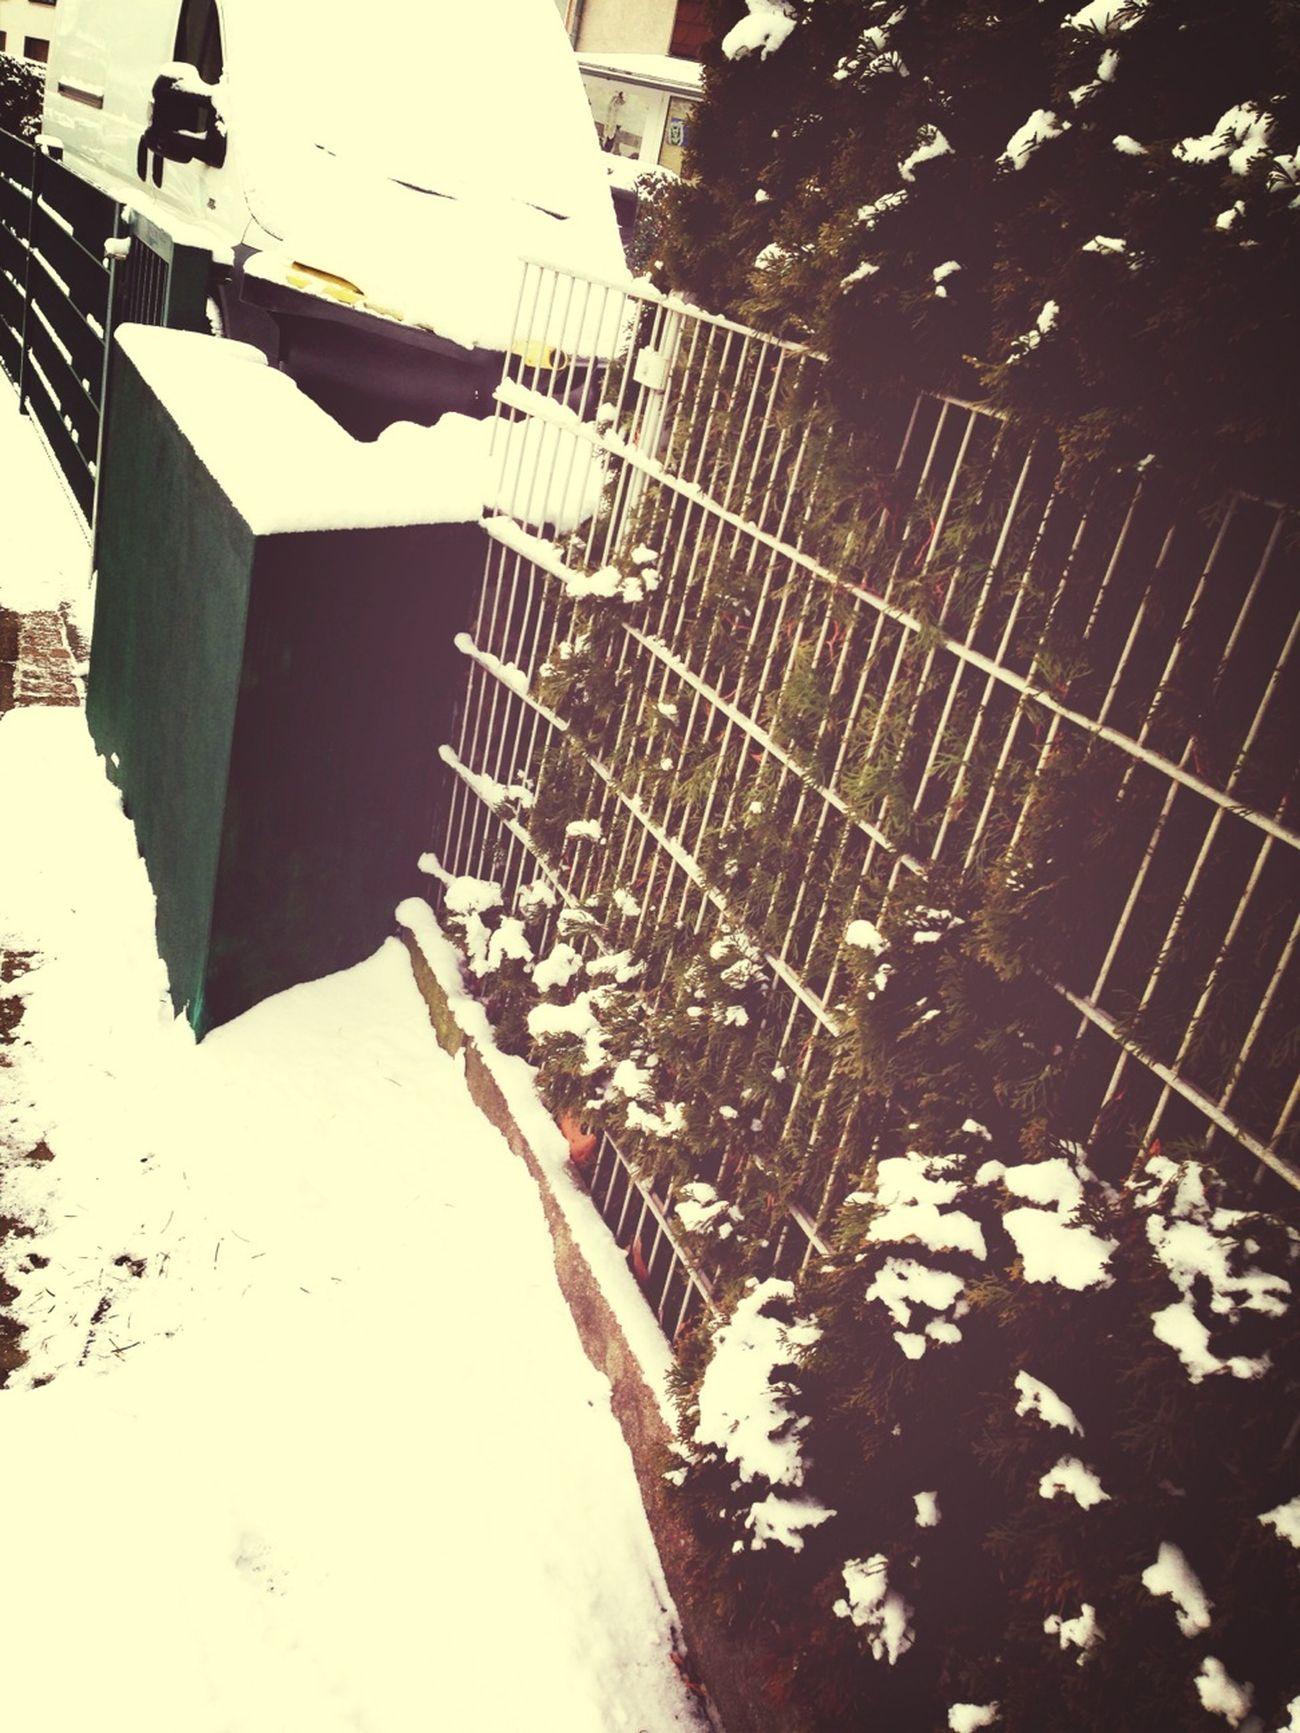 EyeEm Best Shots Snow EyeEm Nature Lover EyeEmBestEdits